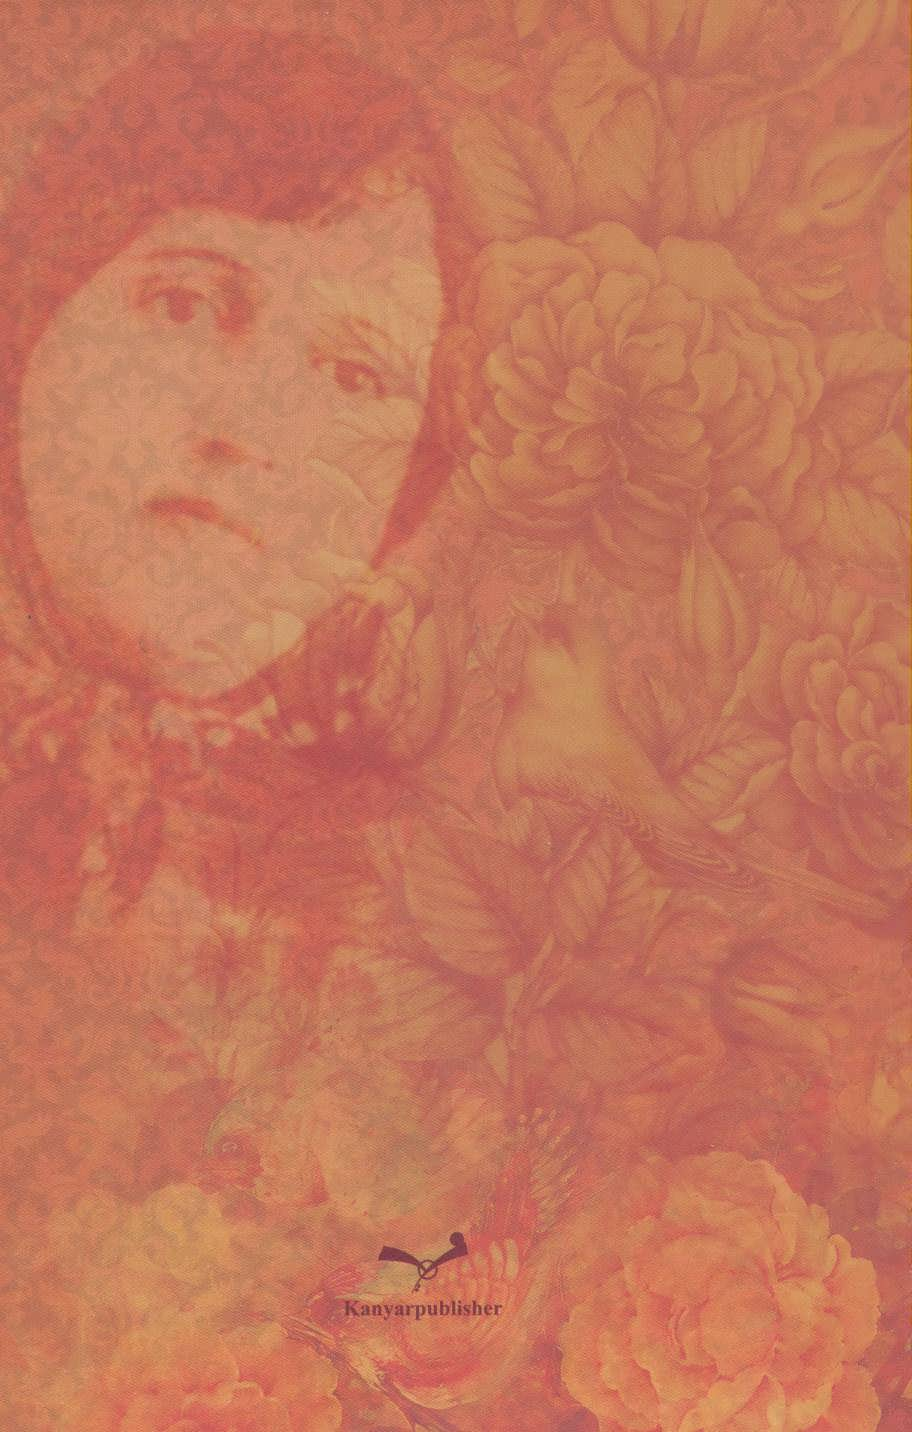 دیوان پروین اعتصامی (باقاب،لب طلایی)